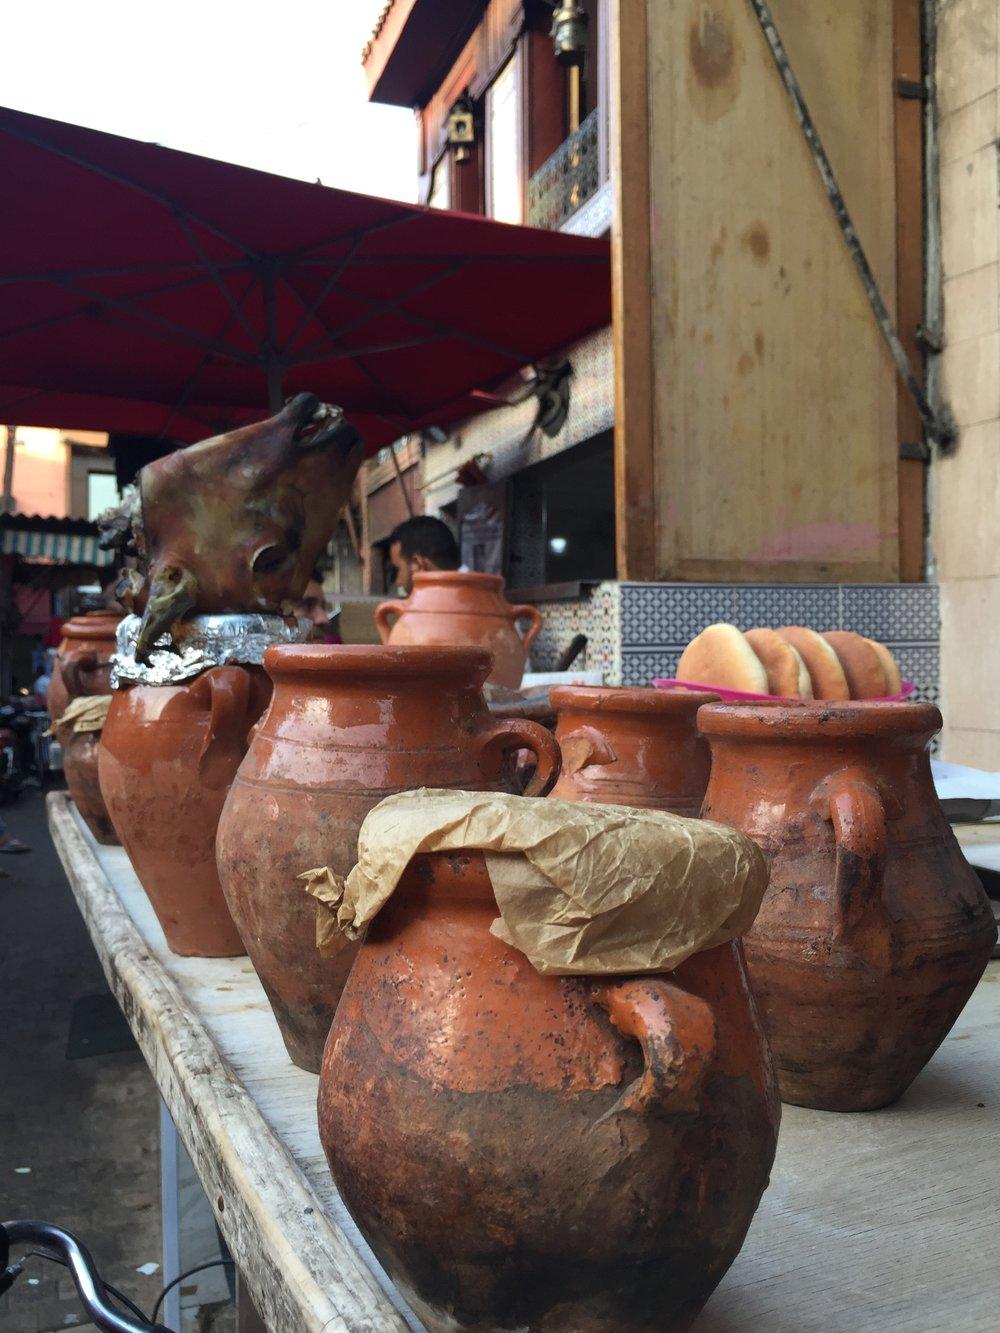 Marrakech Street Food Tour Stop 1